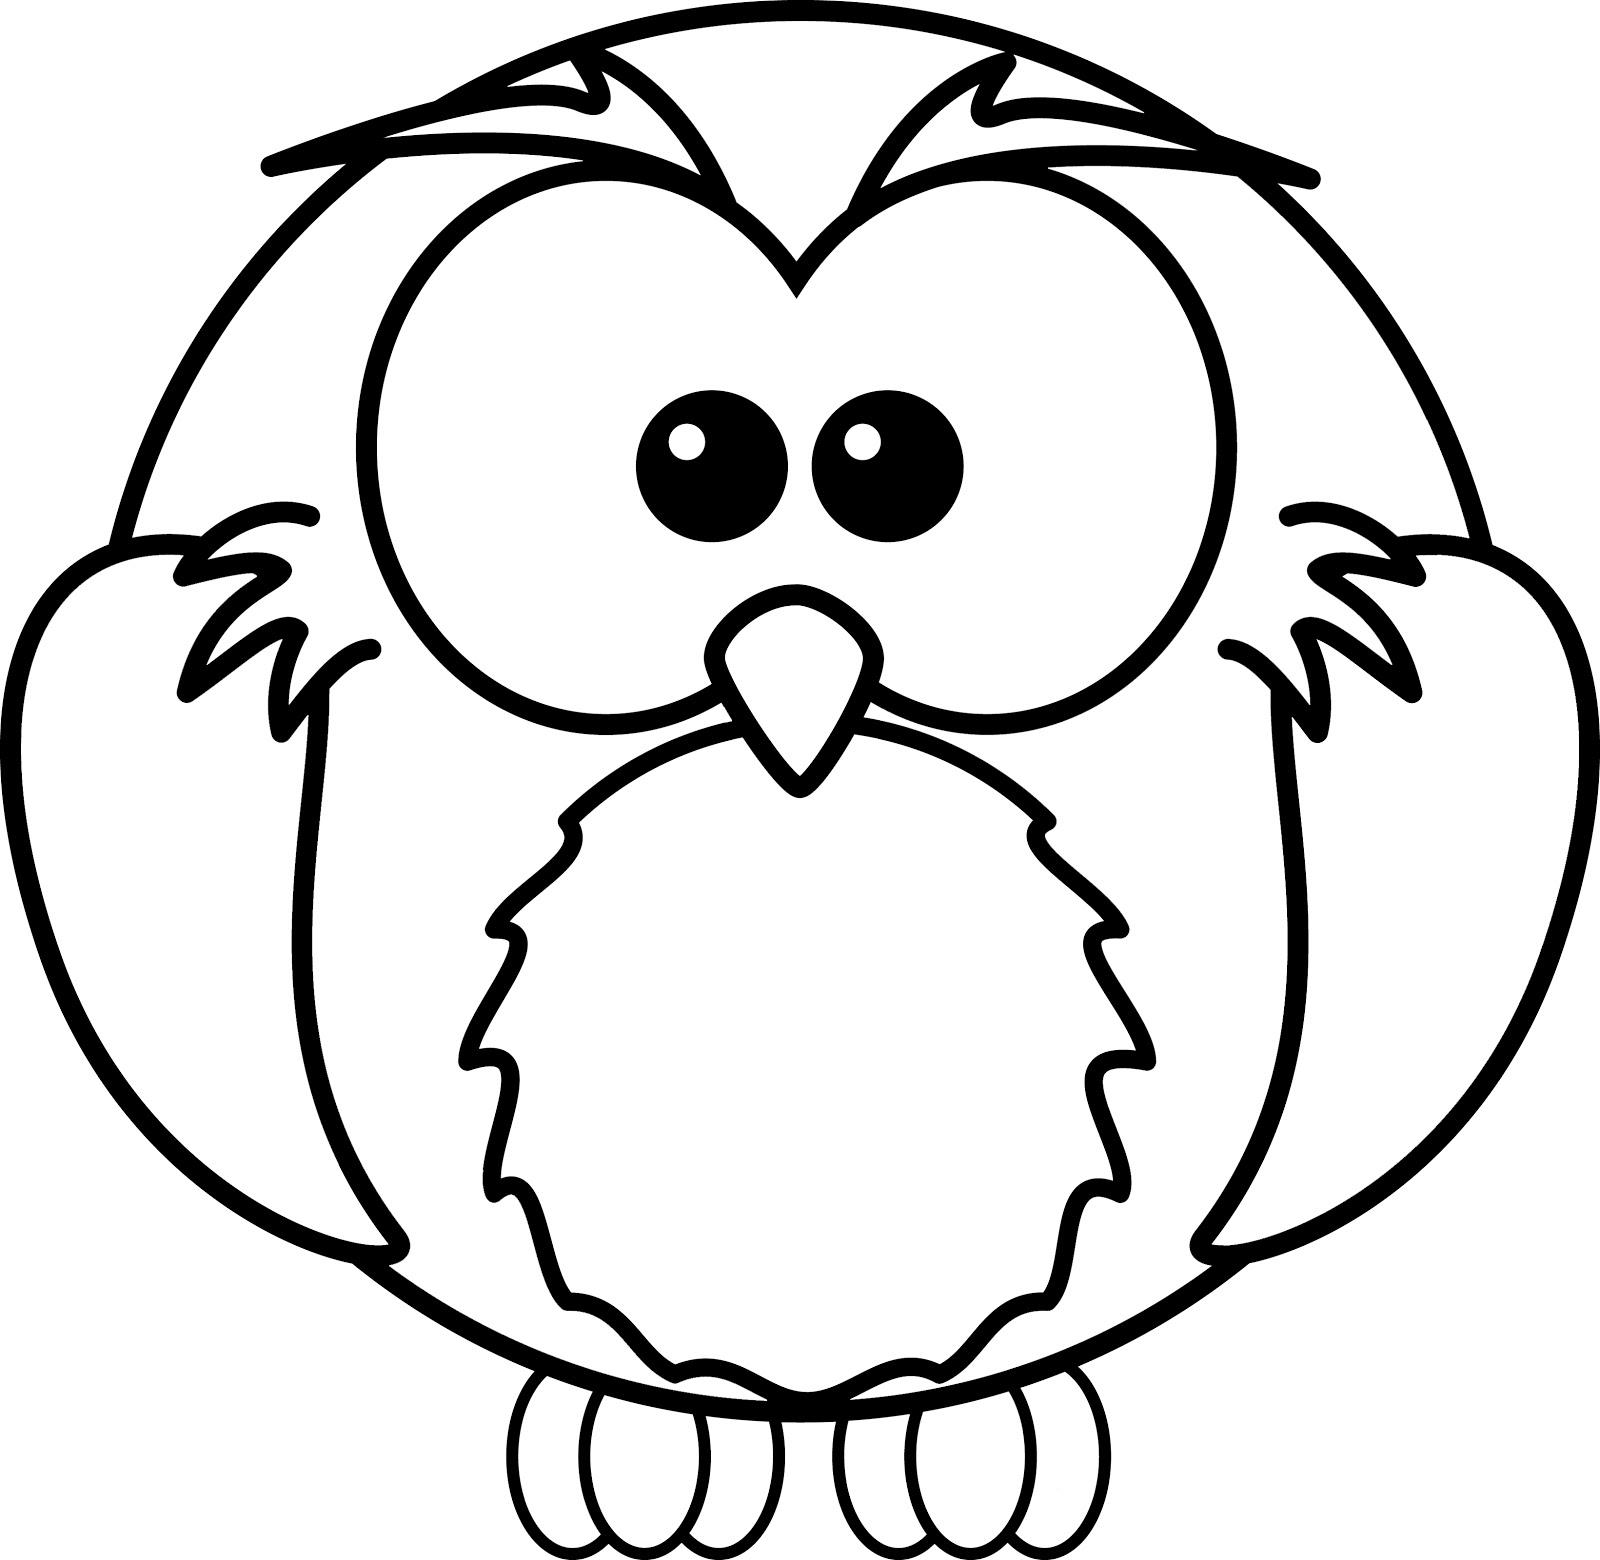 Gambar Mewarnai Burung Hantu Gif Animasi Bergerak 0009 Owl Anggriechan